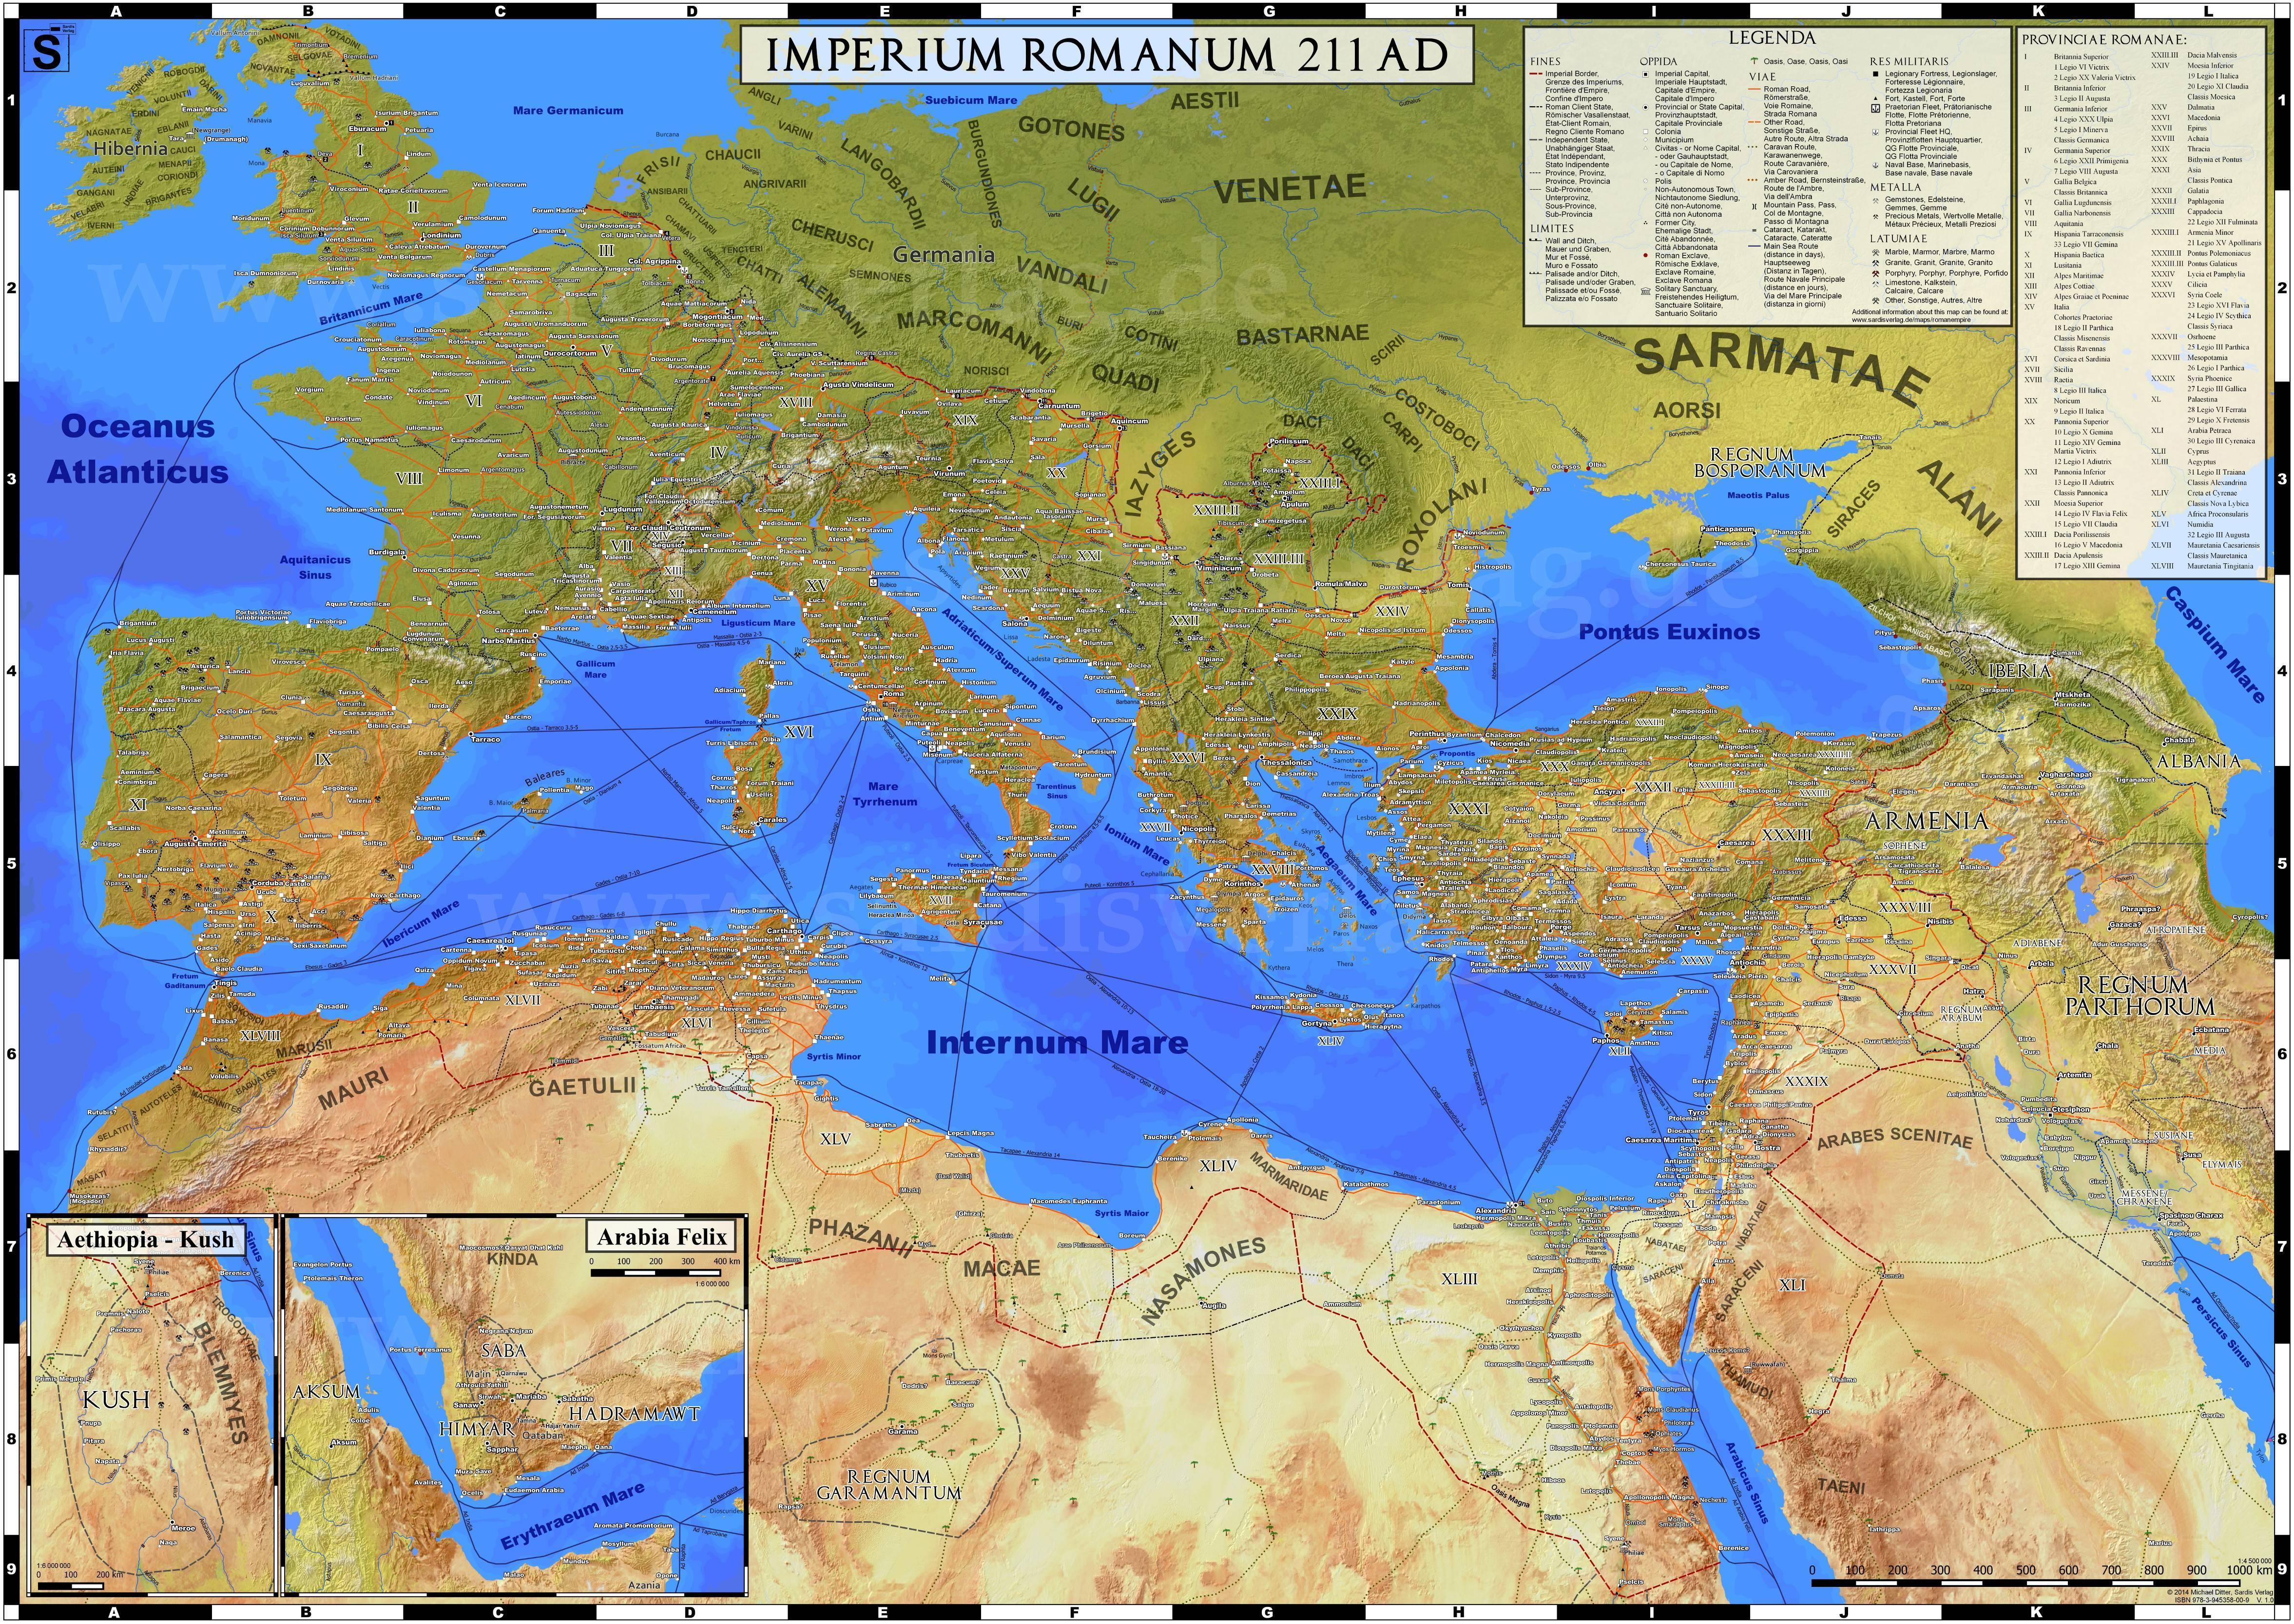 map of roman empire in 211 AD